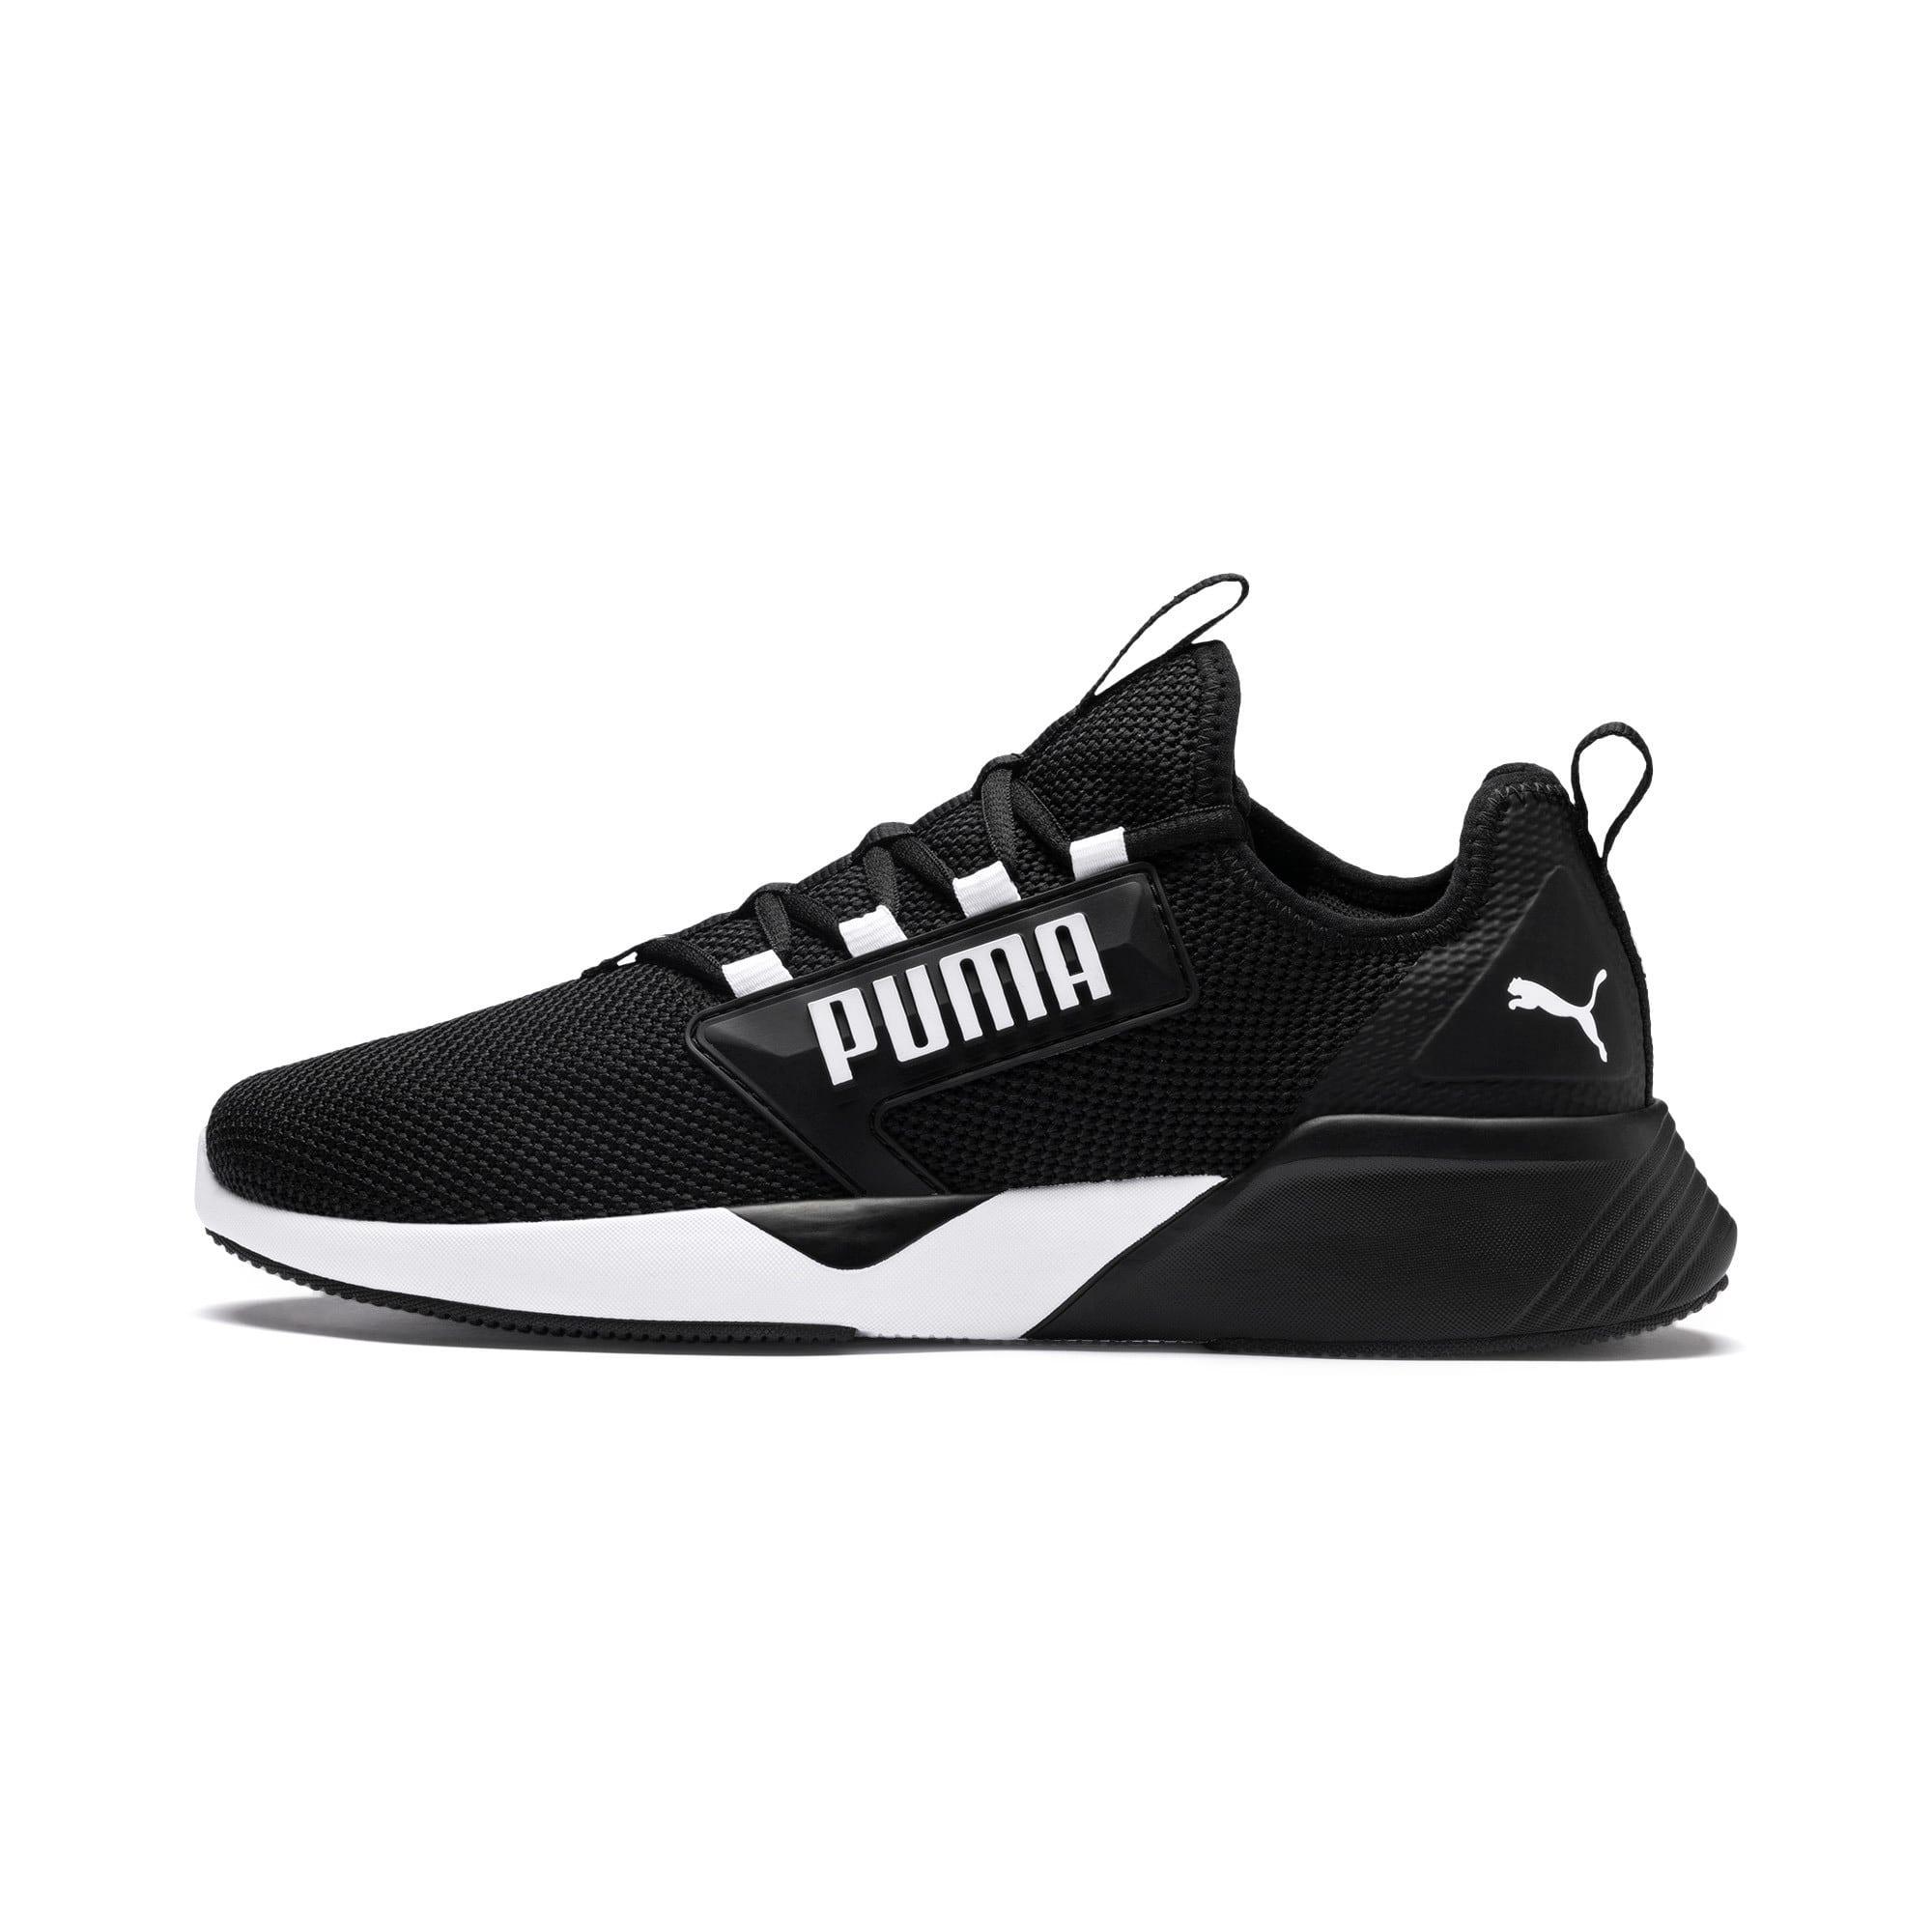 Thumbnail 1 of Retaliate Men's Training Shoes, Puma Black-Puma White, medium